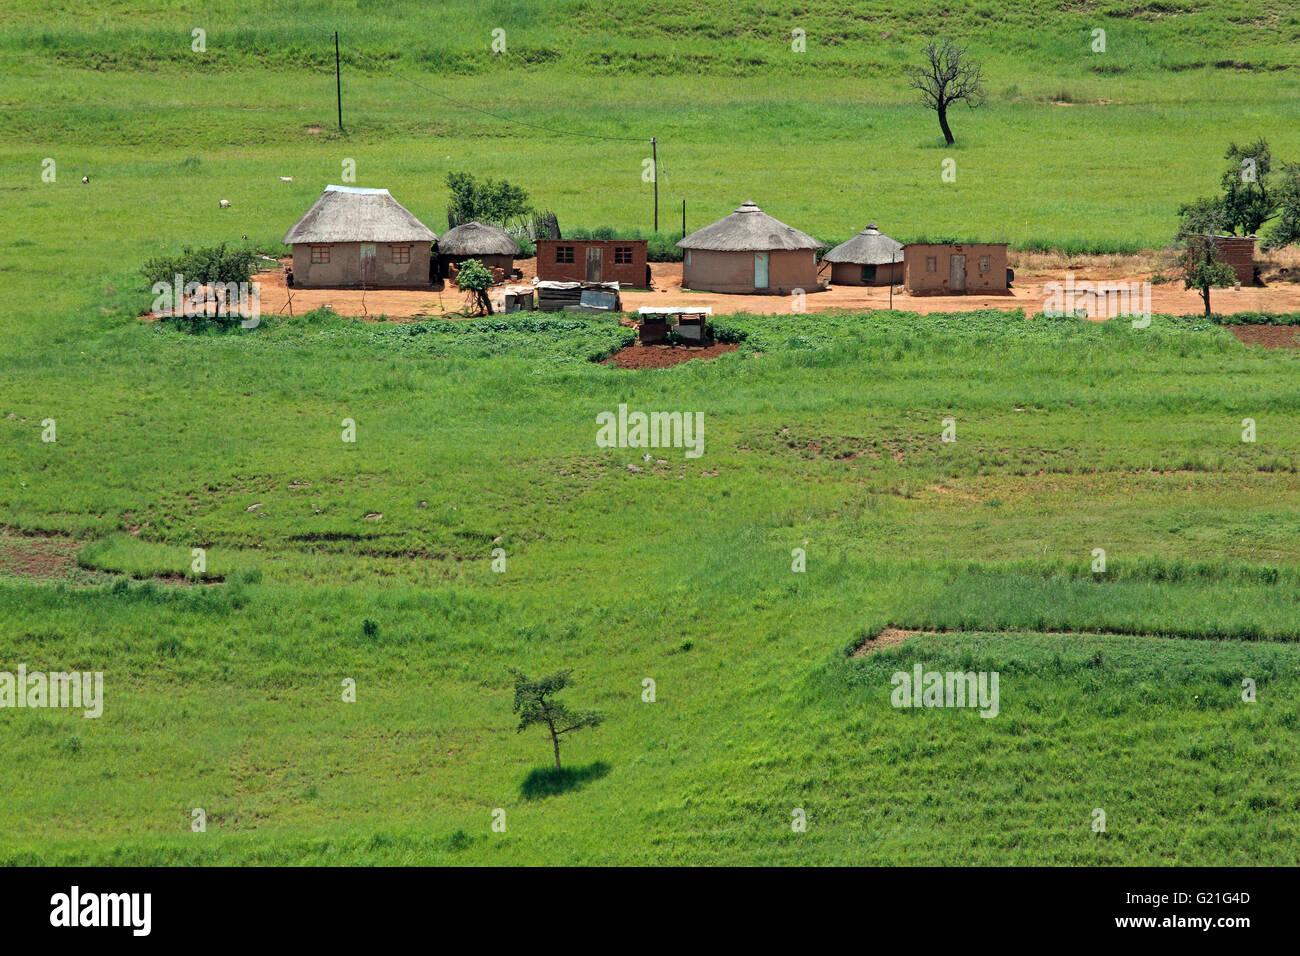 Small rural huts in mountainous grassland, KwaZulu-Natal, South Africa Stock Photo